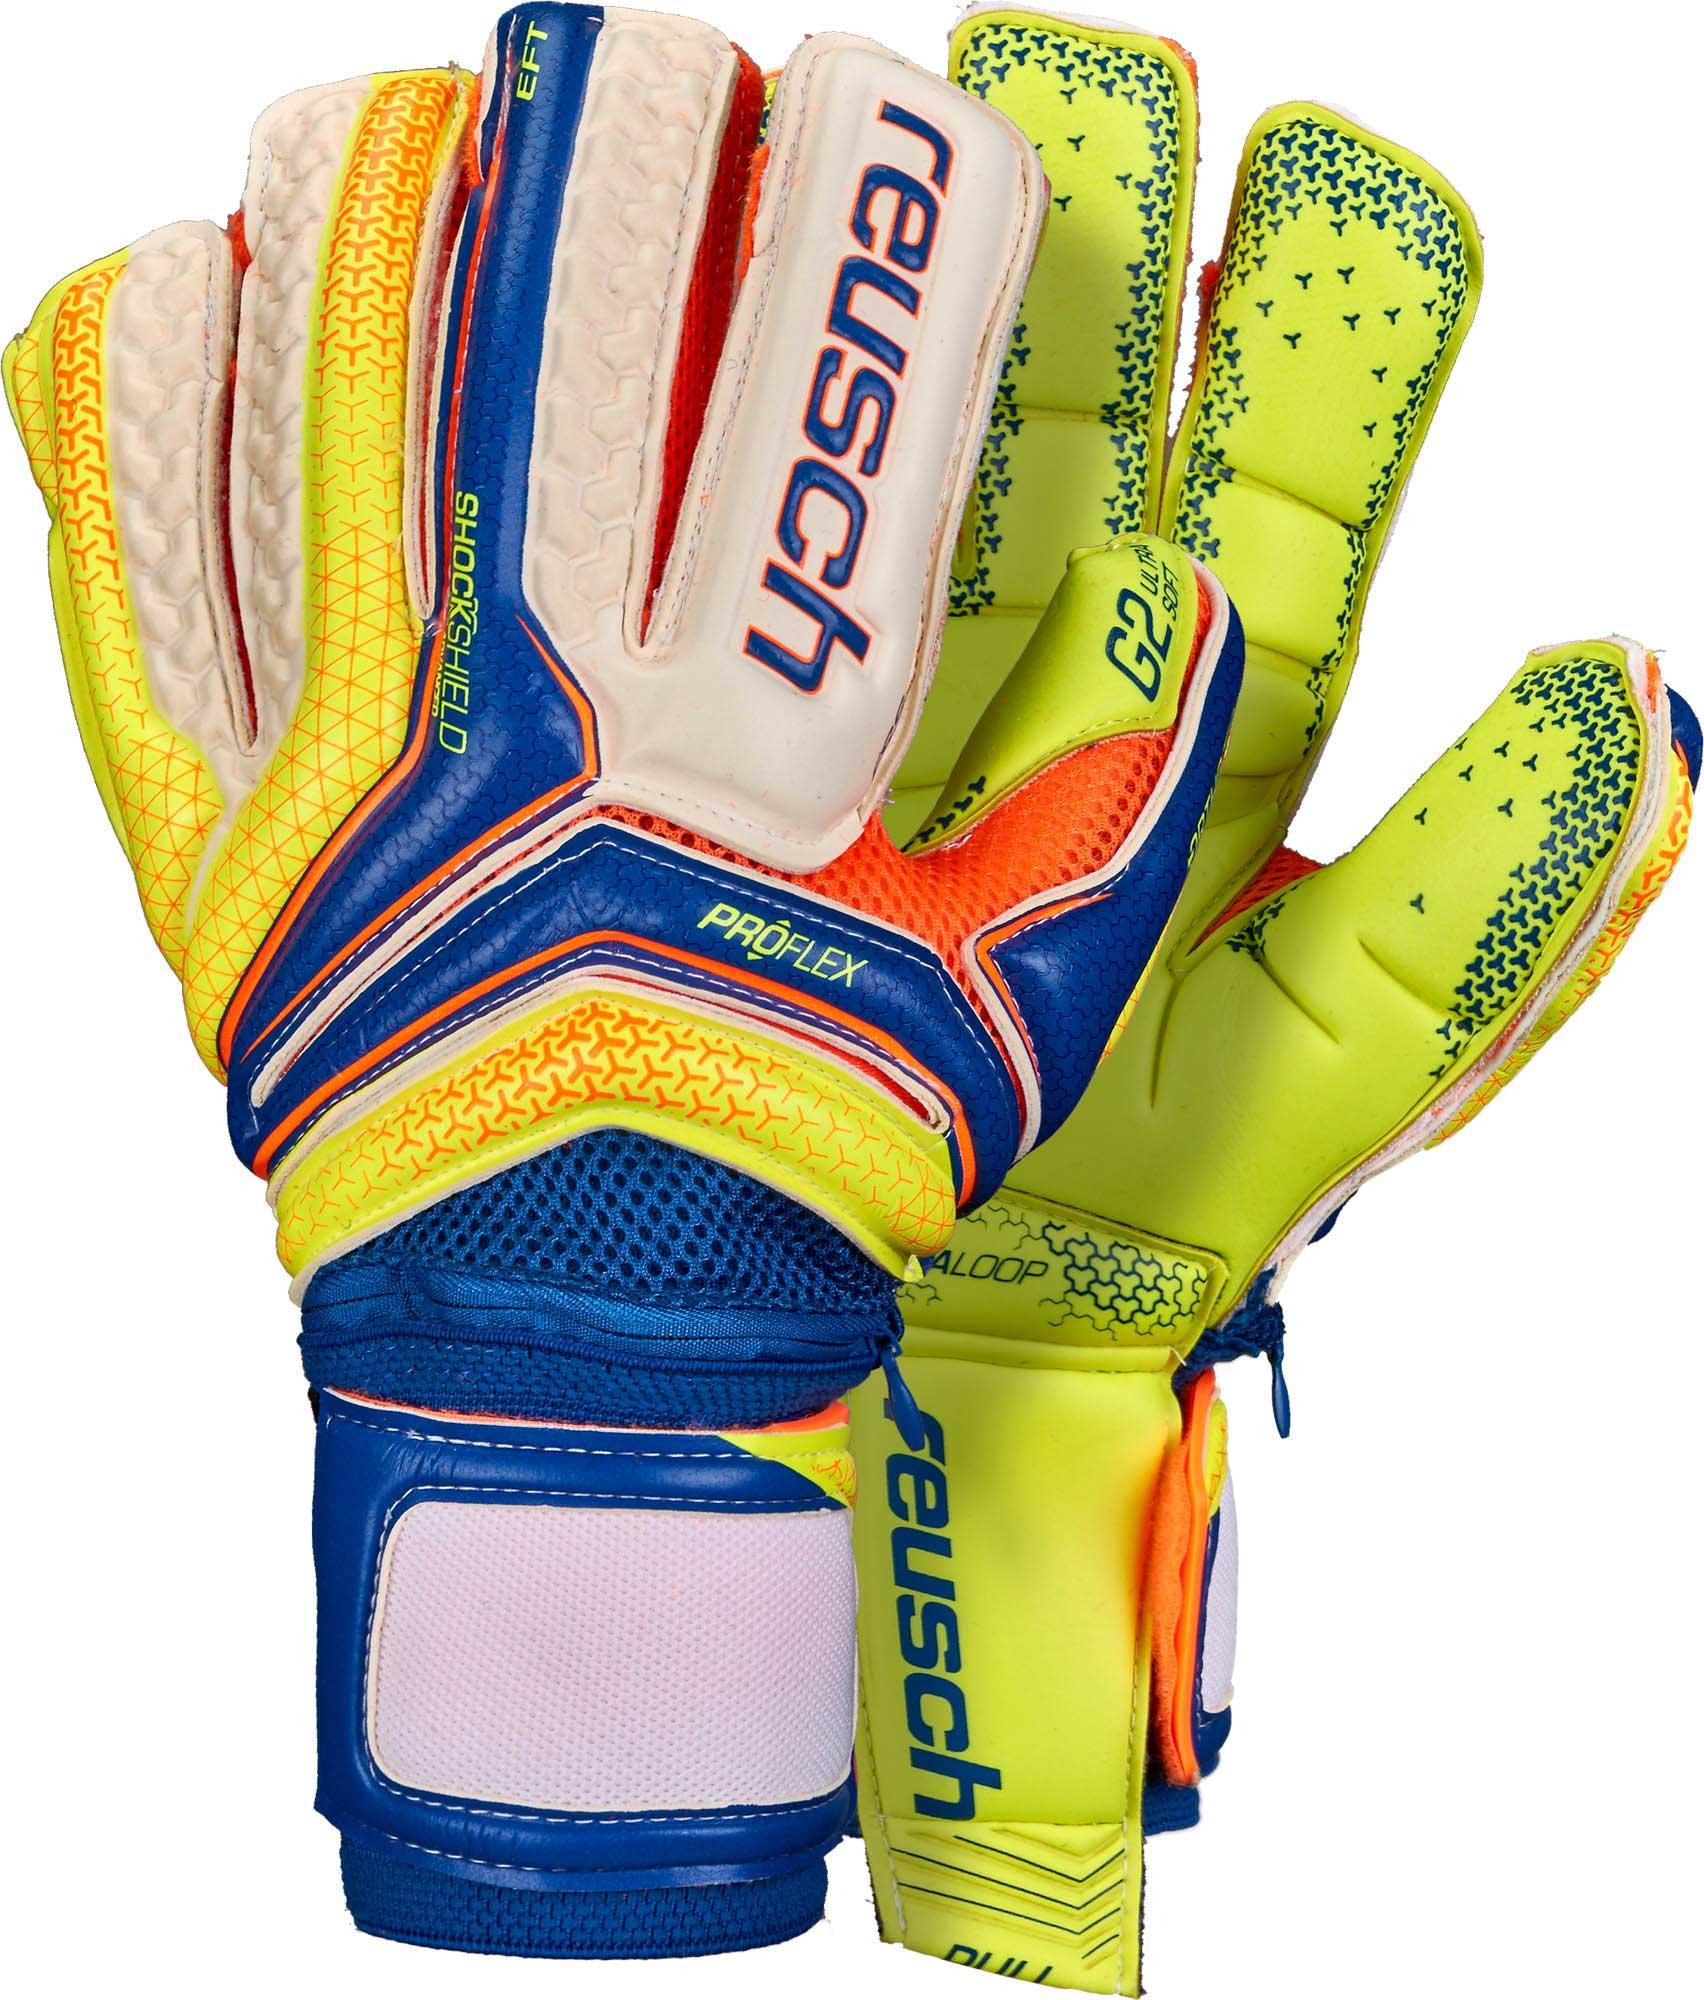 7d2fe7701 Reusch Serathor Supreme G2 Ortho-Tec Goalkeeper Gloves – Dazzling  Blue/Safety Yellow